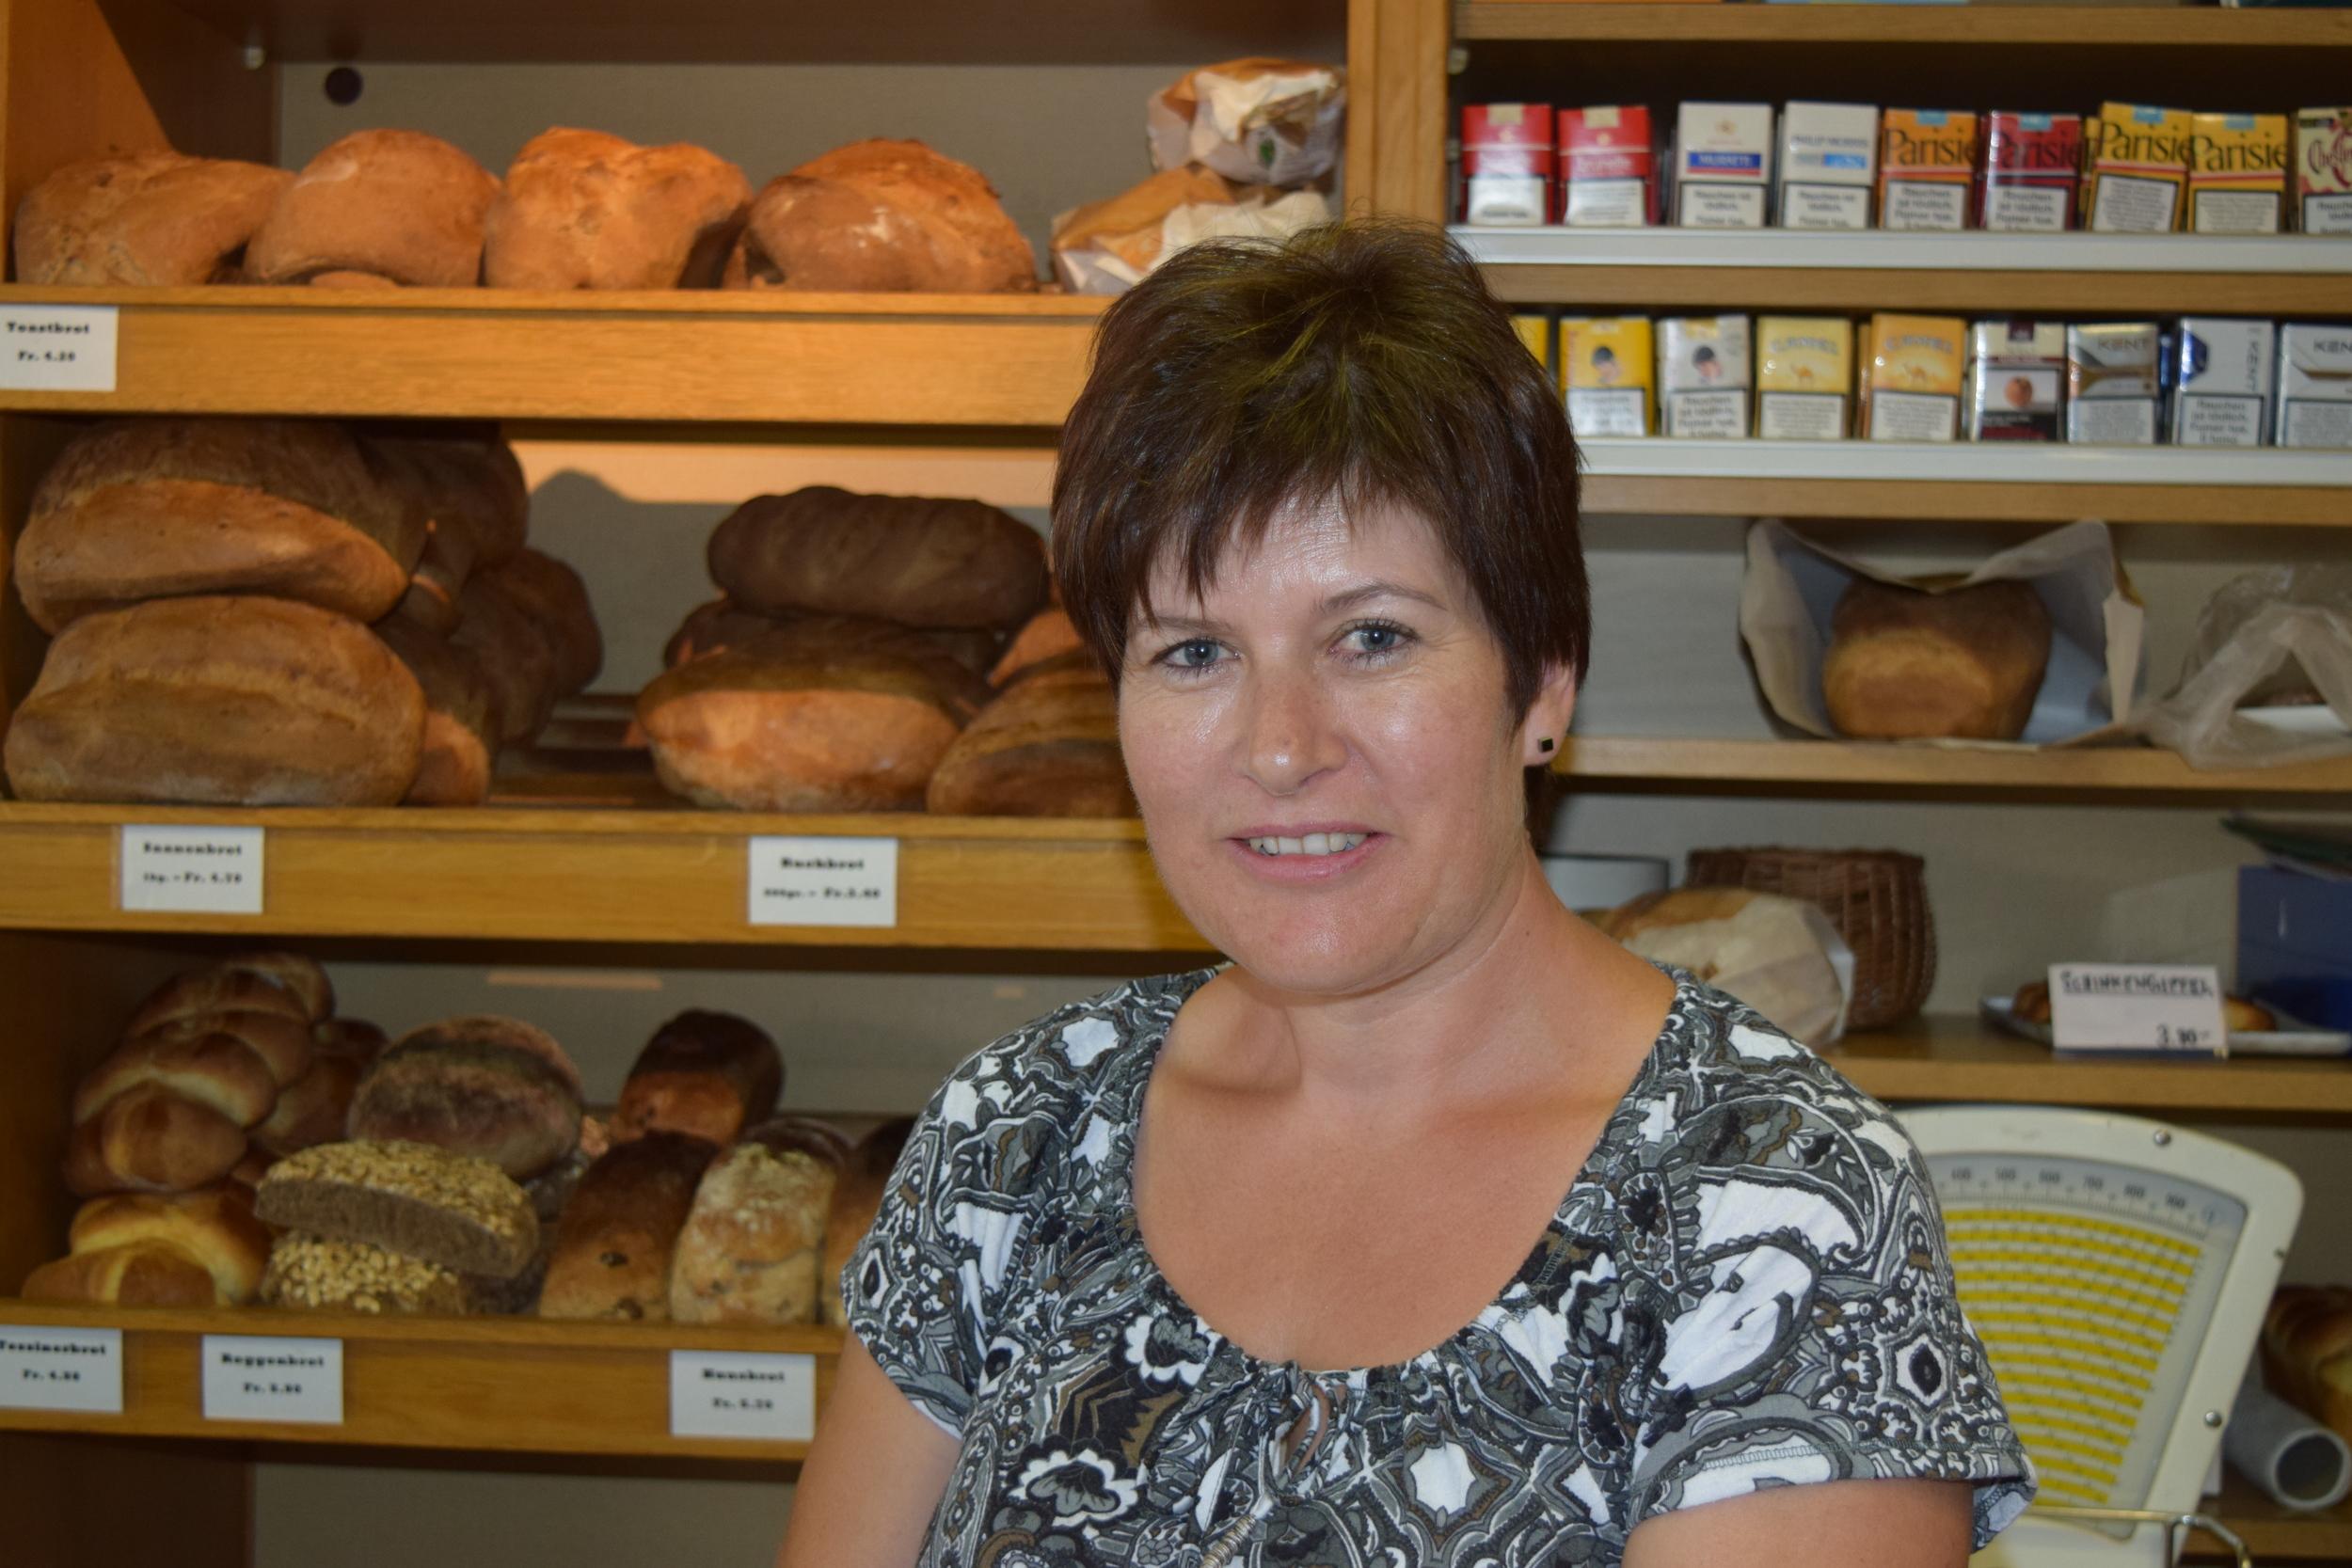 Sonja Wyssen